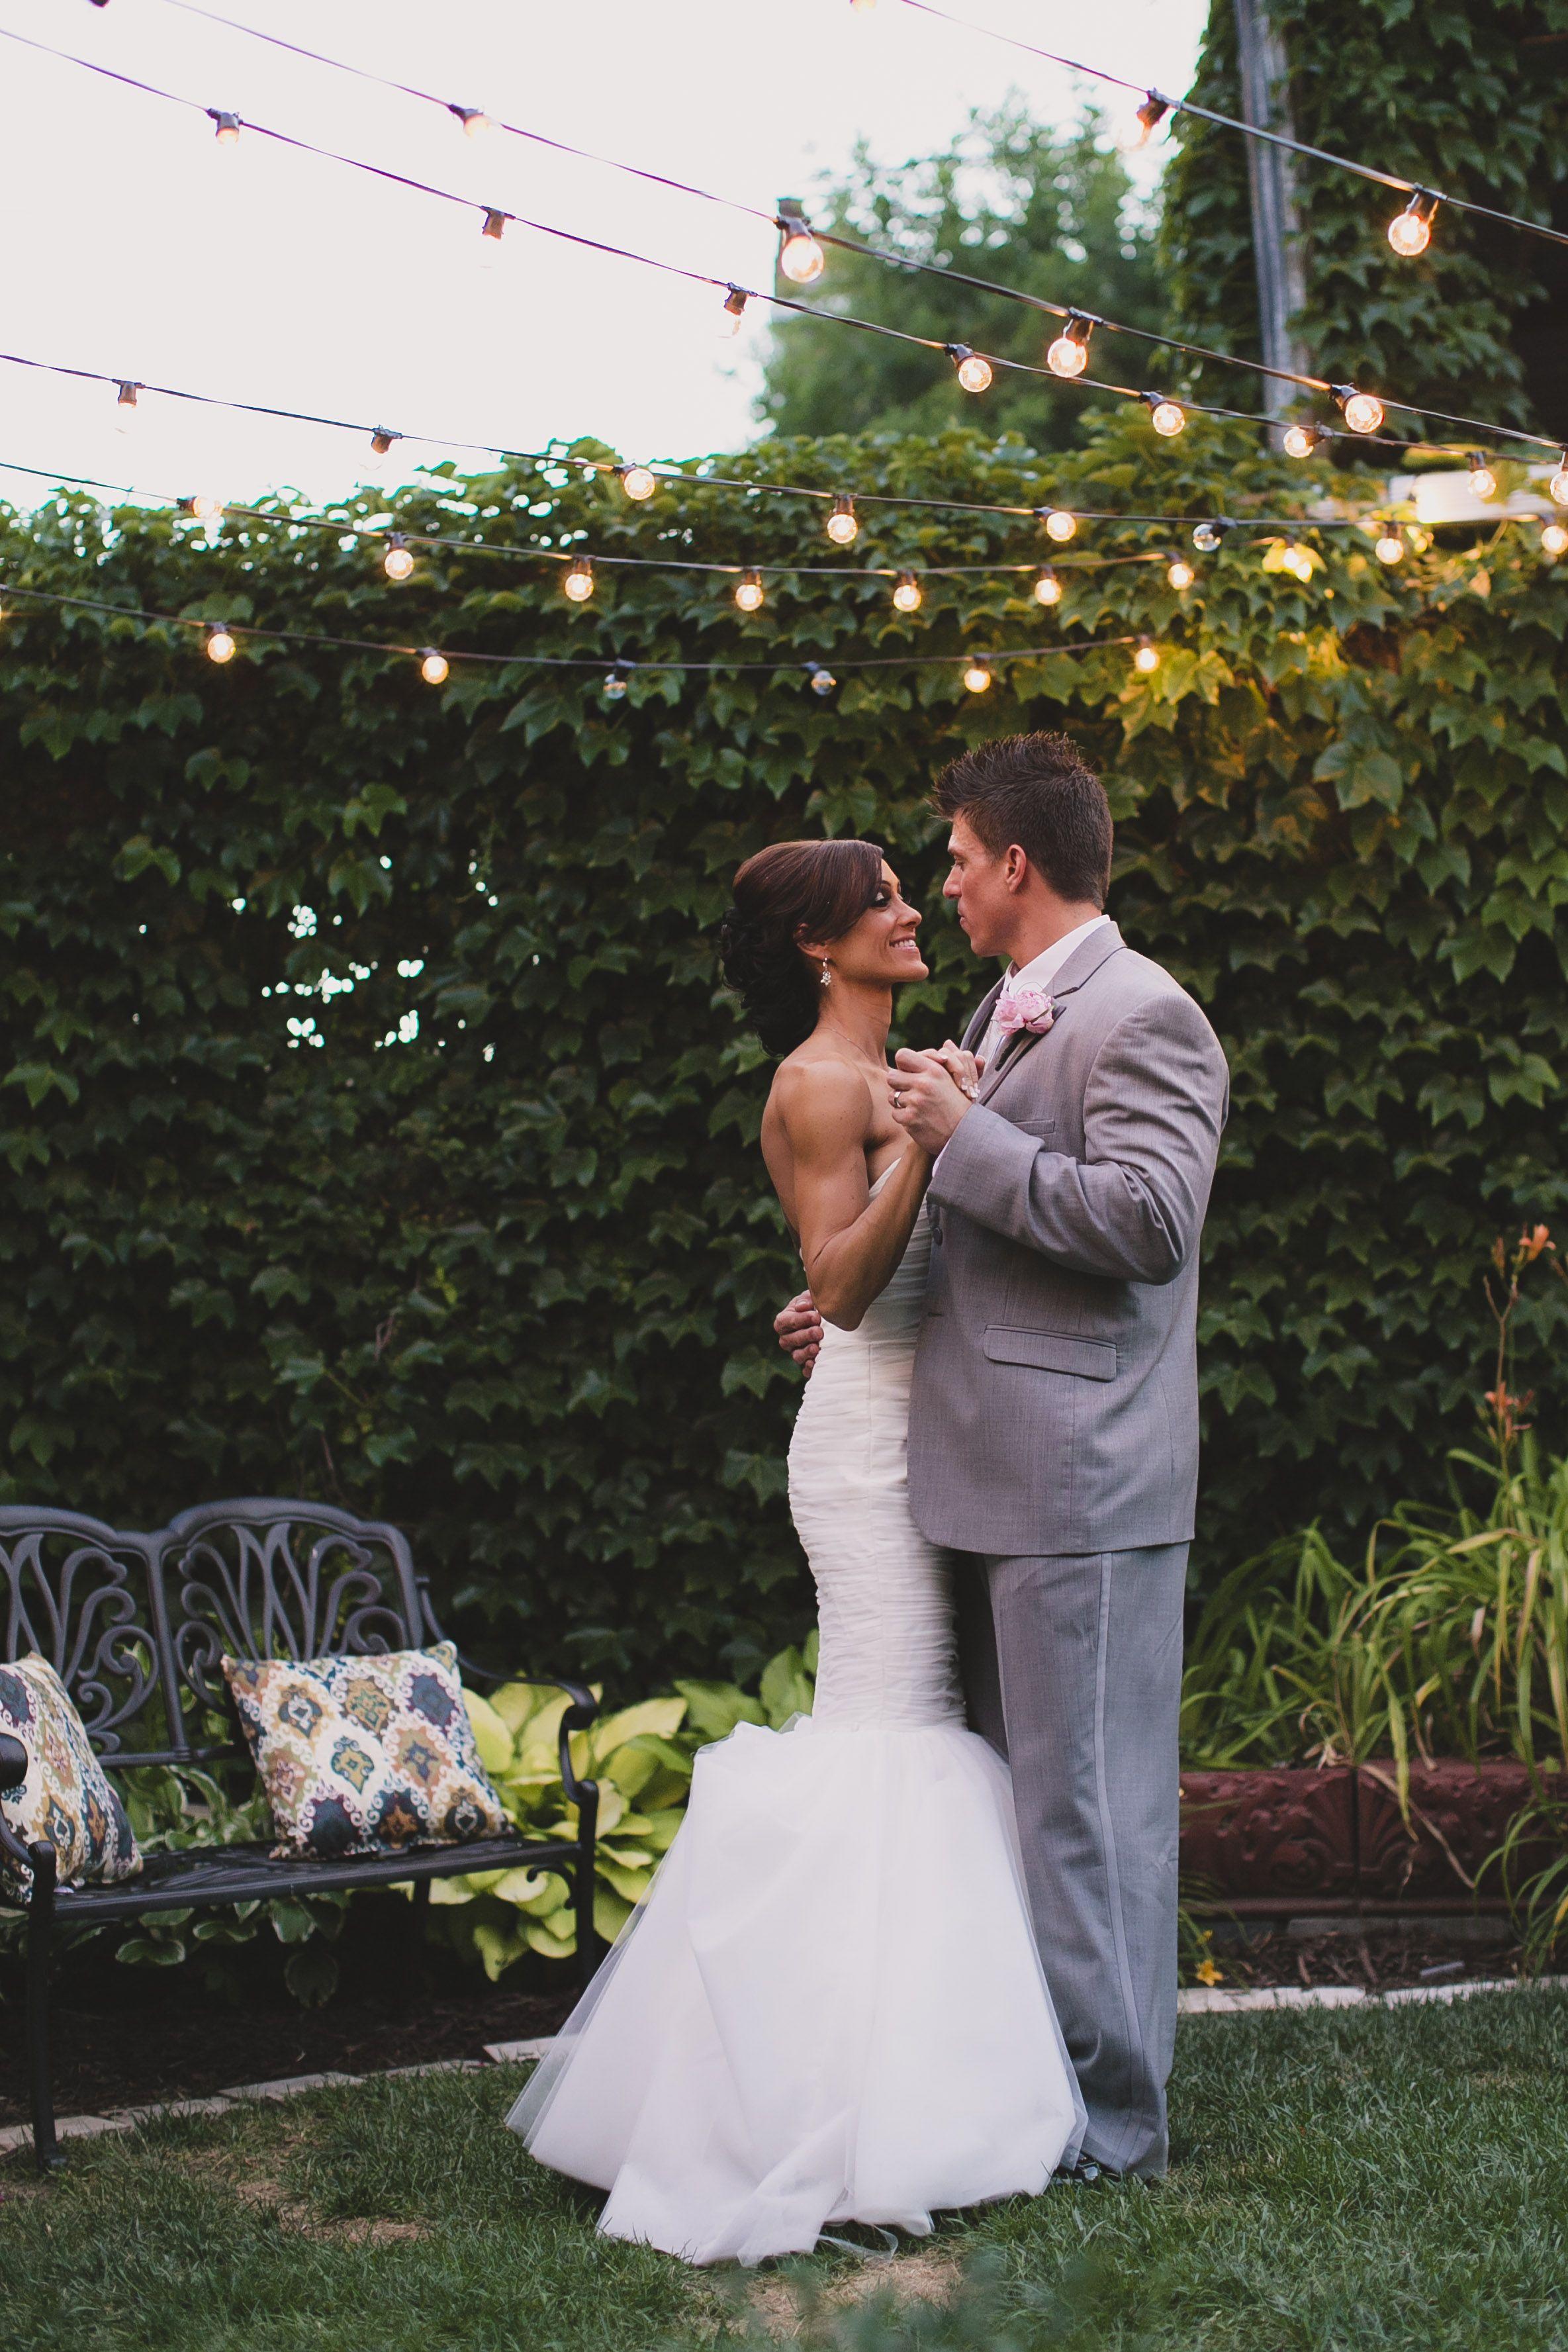 Wedding Reception Lighting Photography: Wedding Reception Lighting & Decor